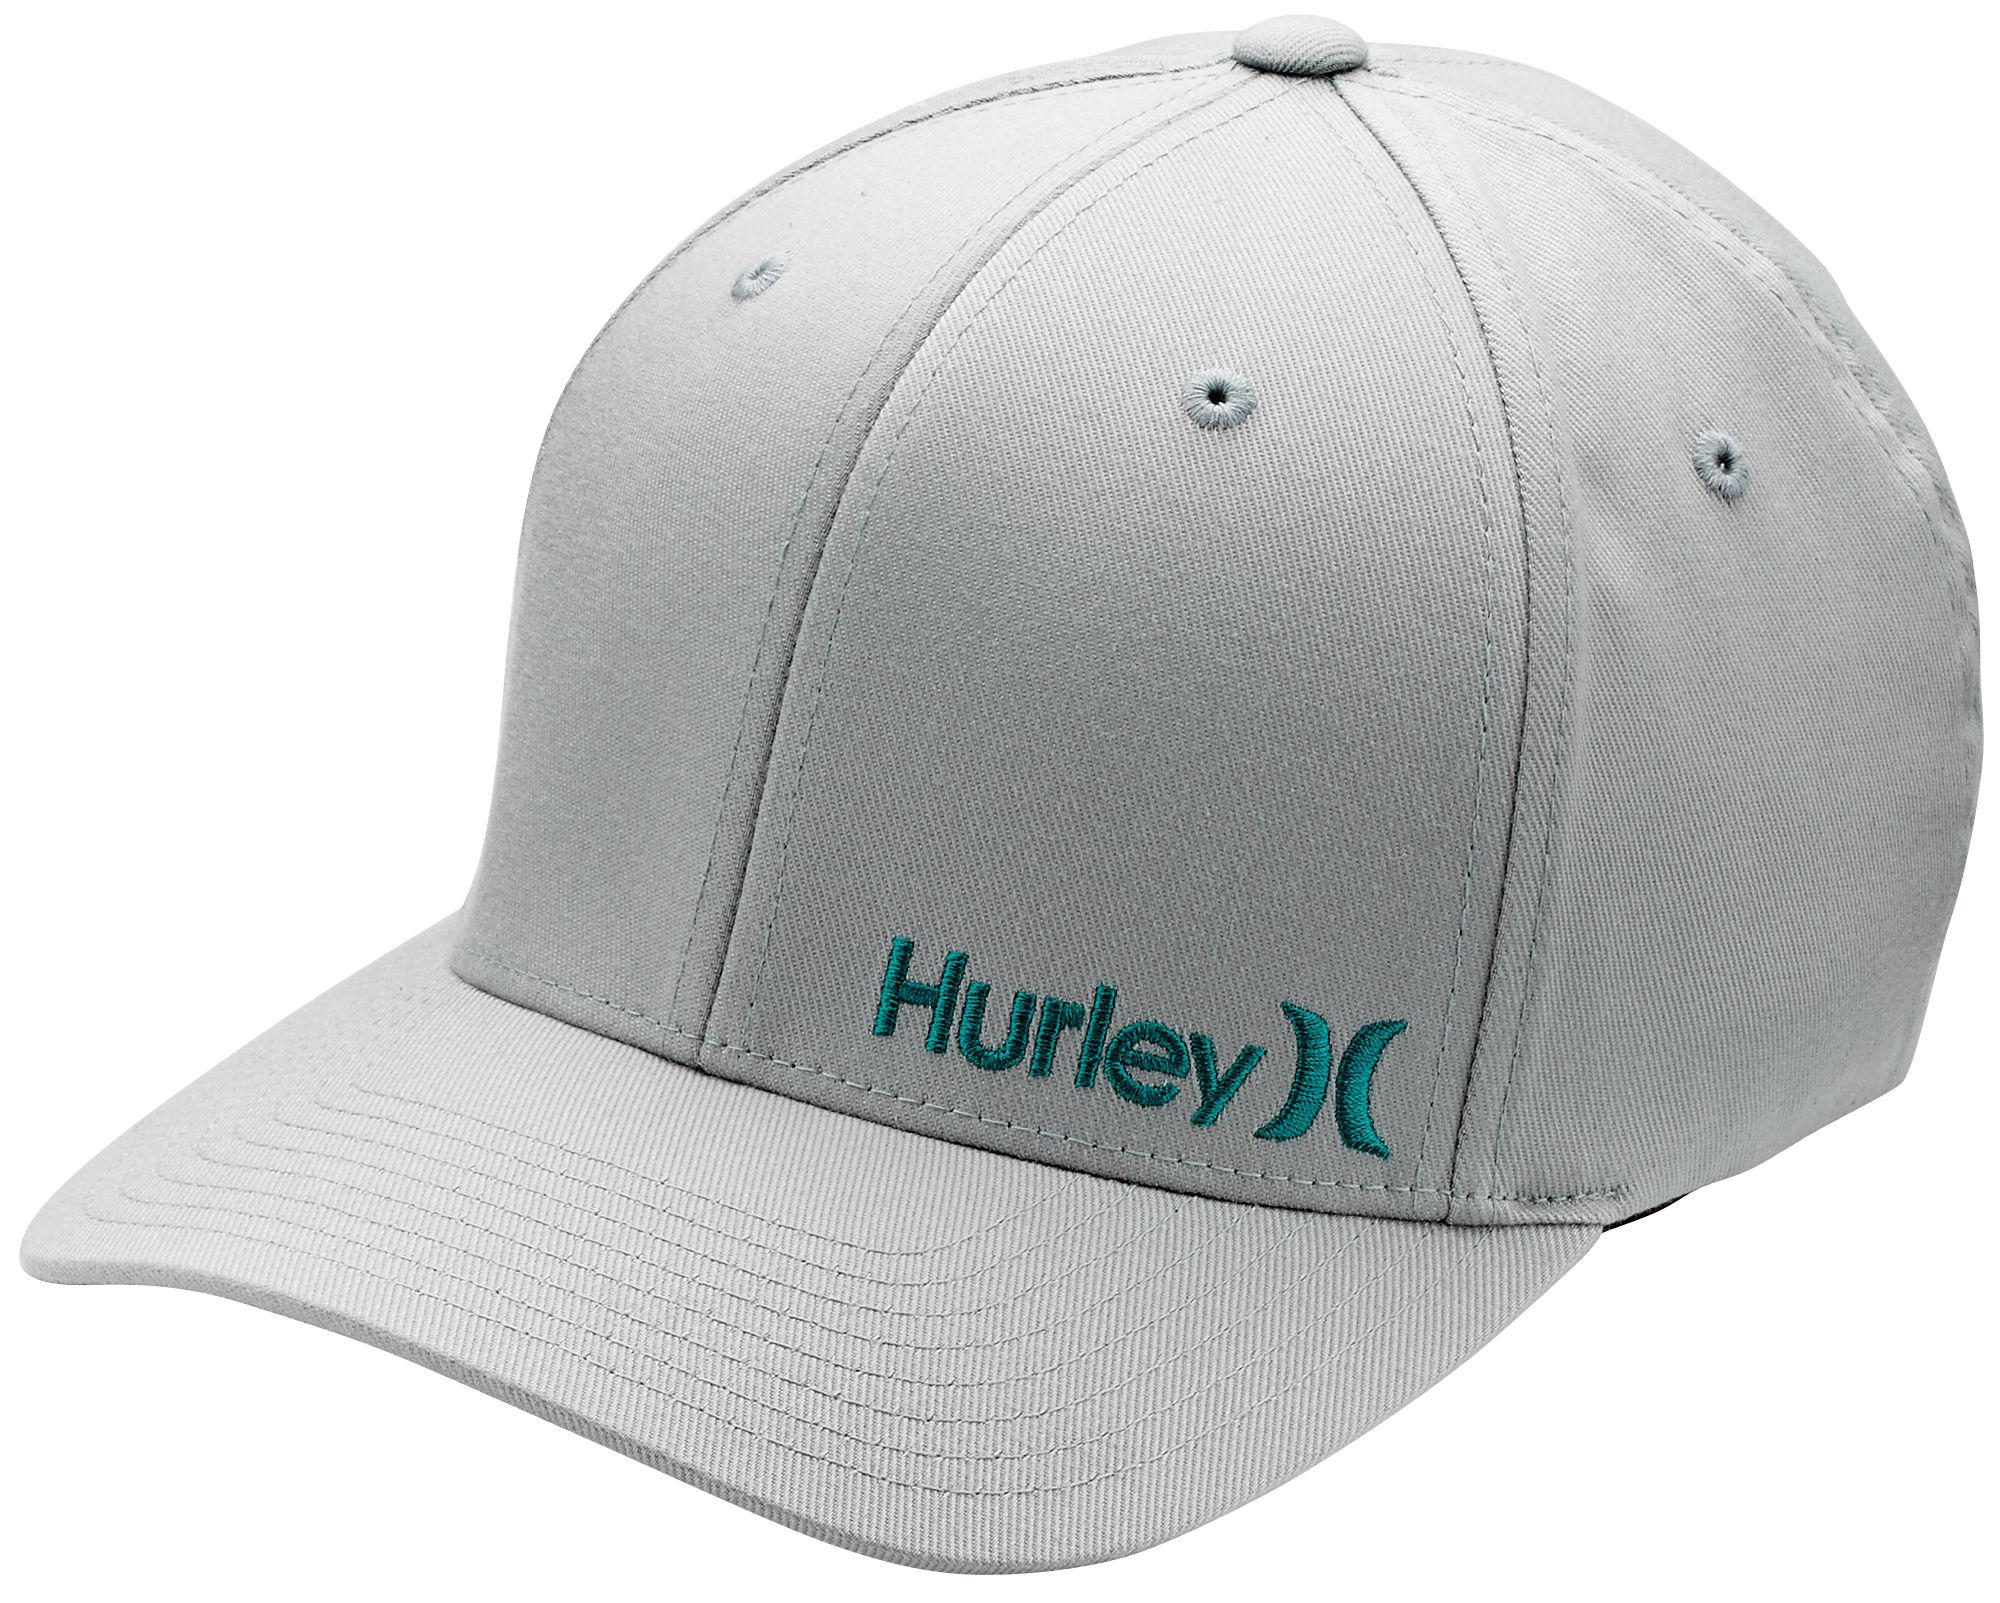 3c355d98d canada hurley phantom bp hat 47ffc 80802